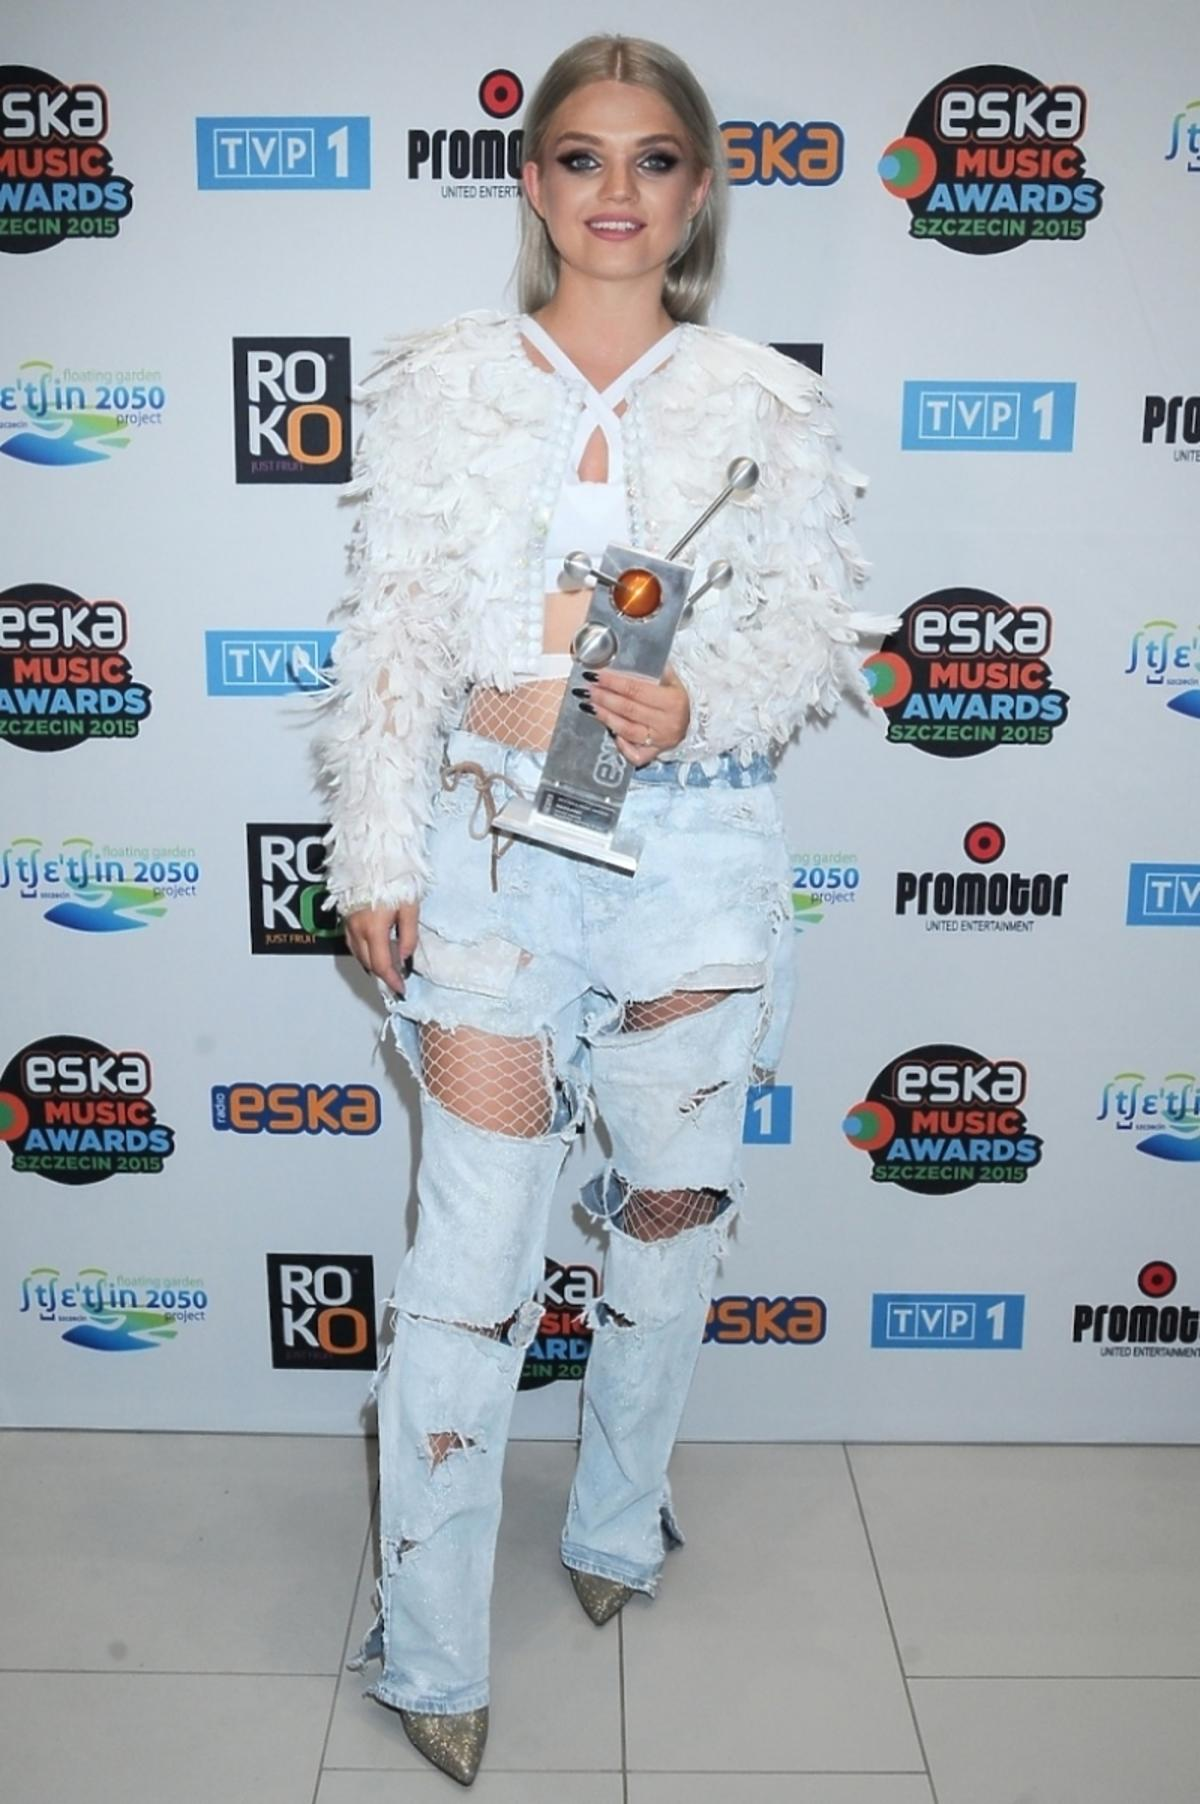 Margaret na Eska Music Awards